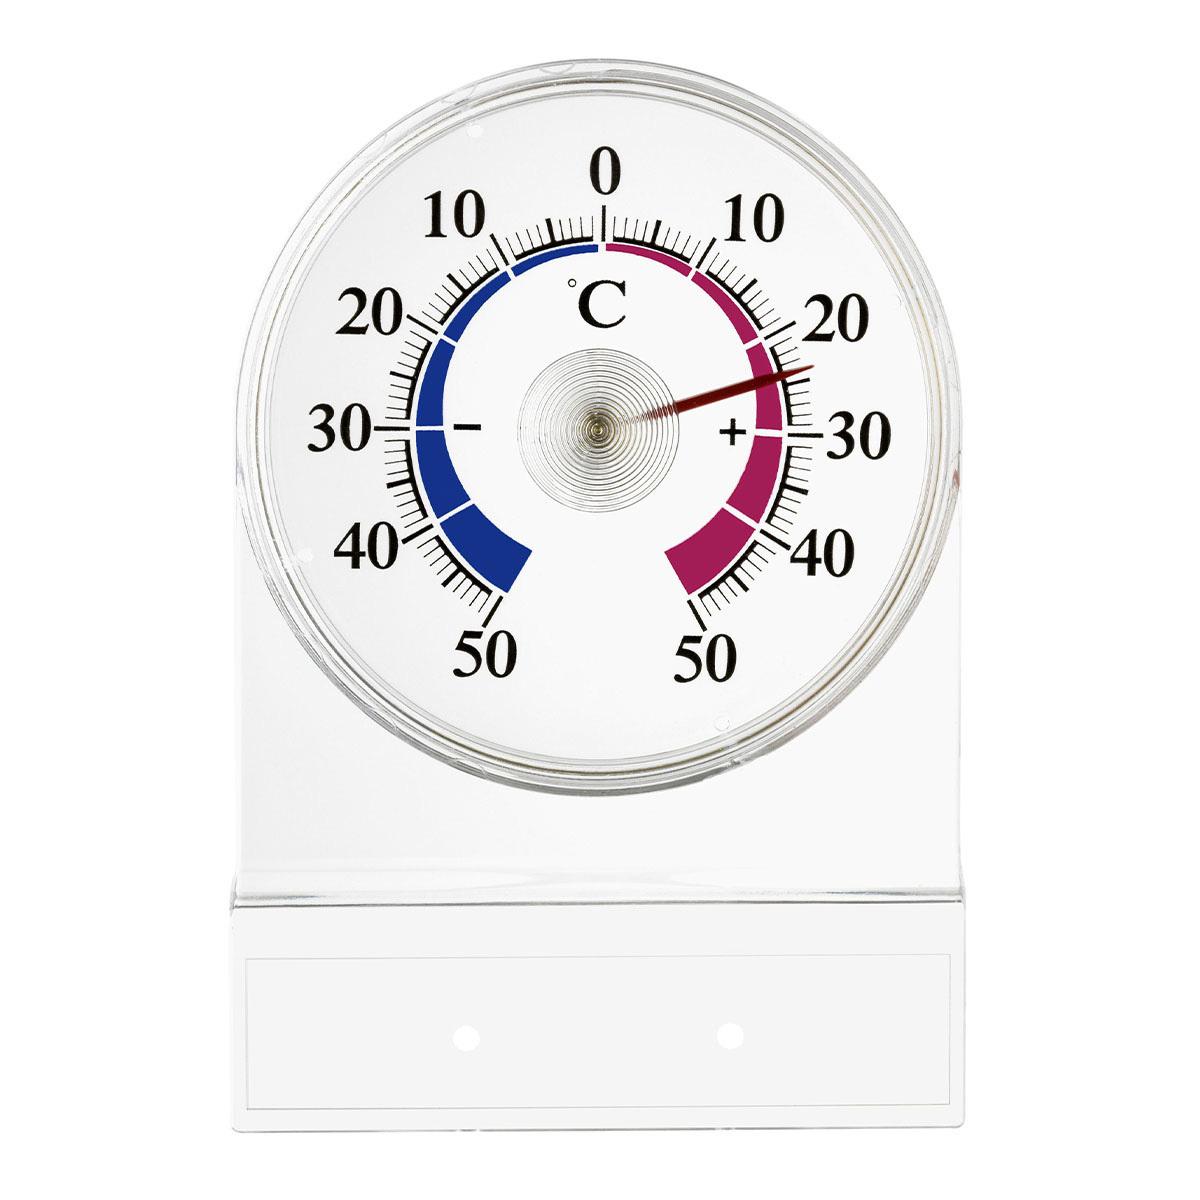 14-6003-analoges-fensterthermometer1-1200x1200px.jpg